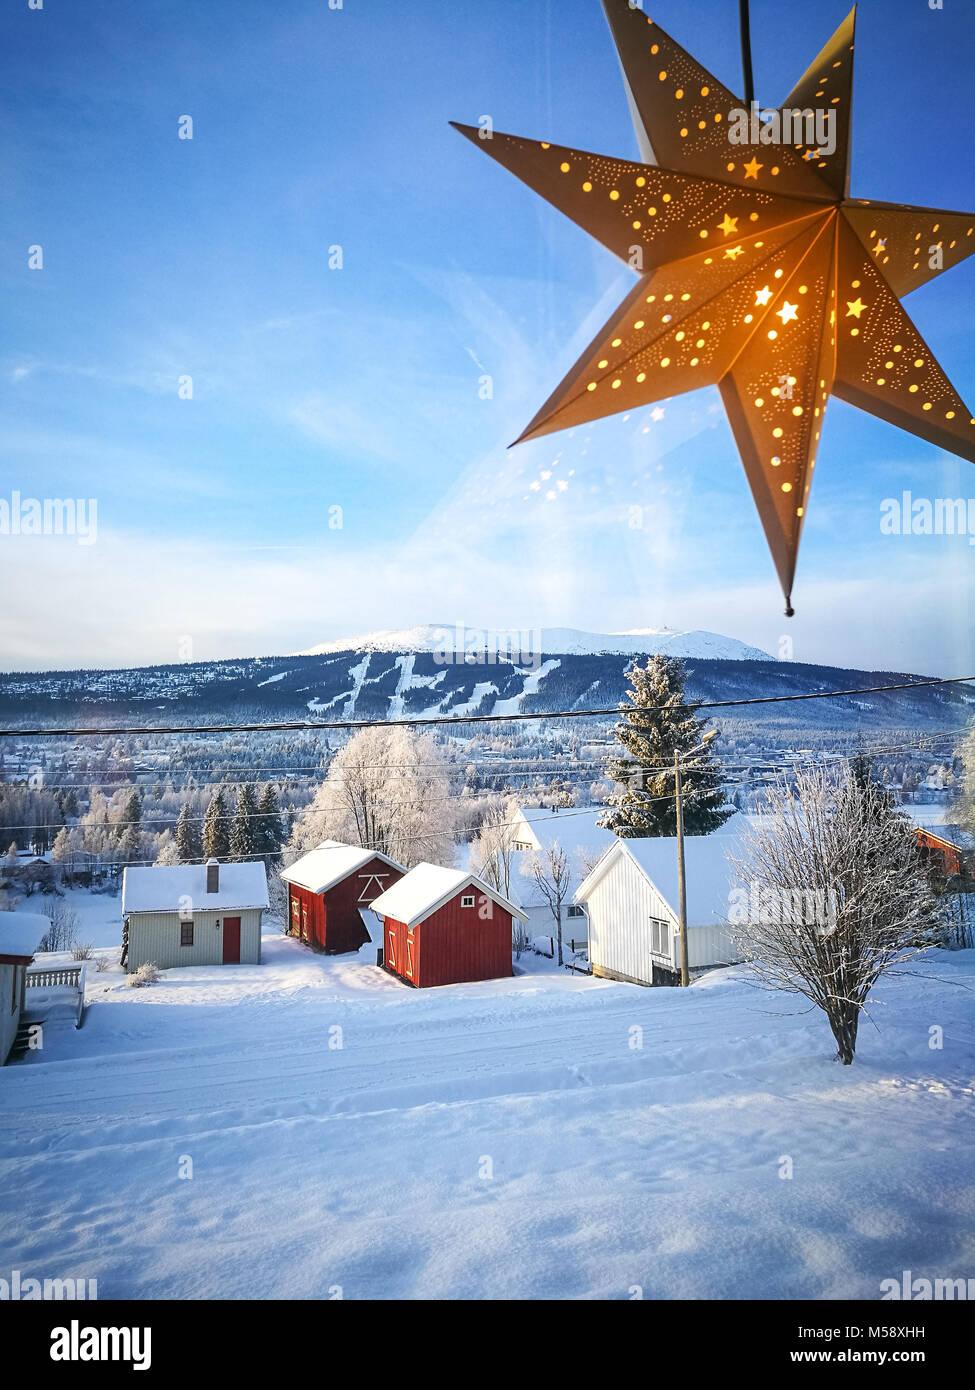 Norway Christmas Snow Stock Photos & Norway Christmas Snow Stock ...